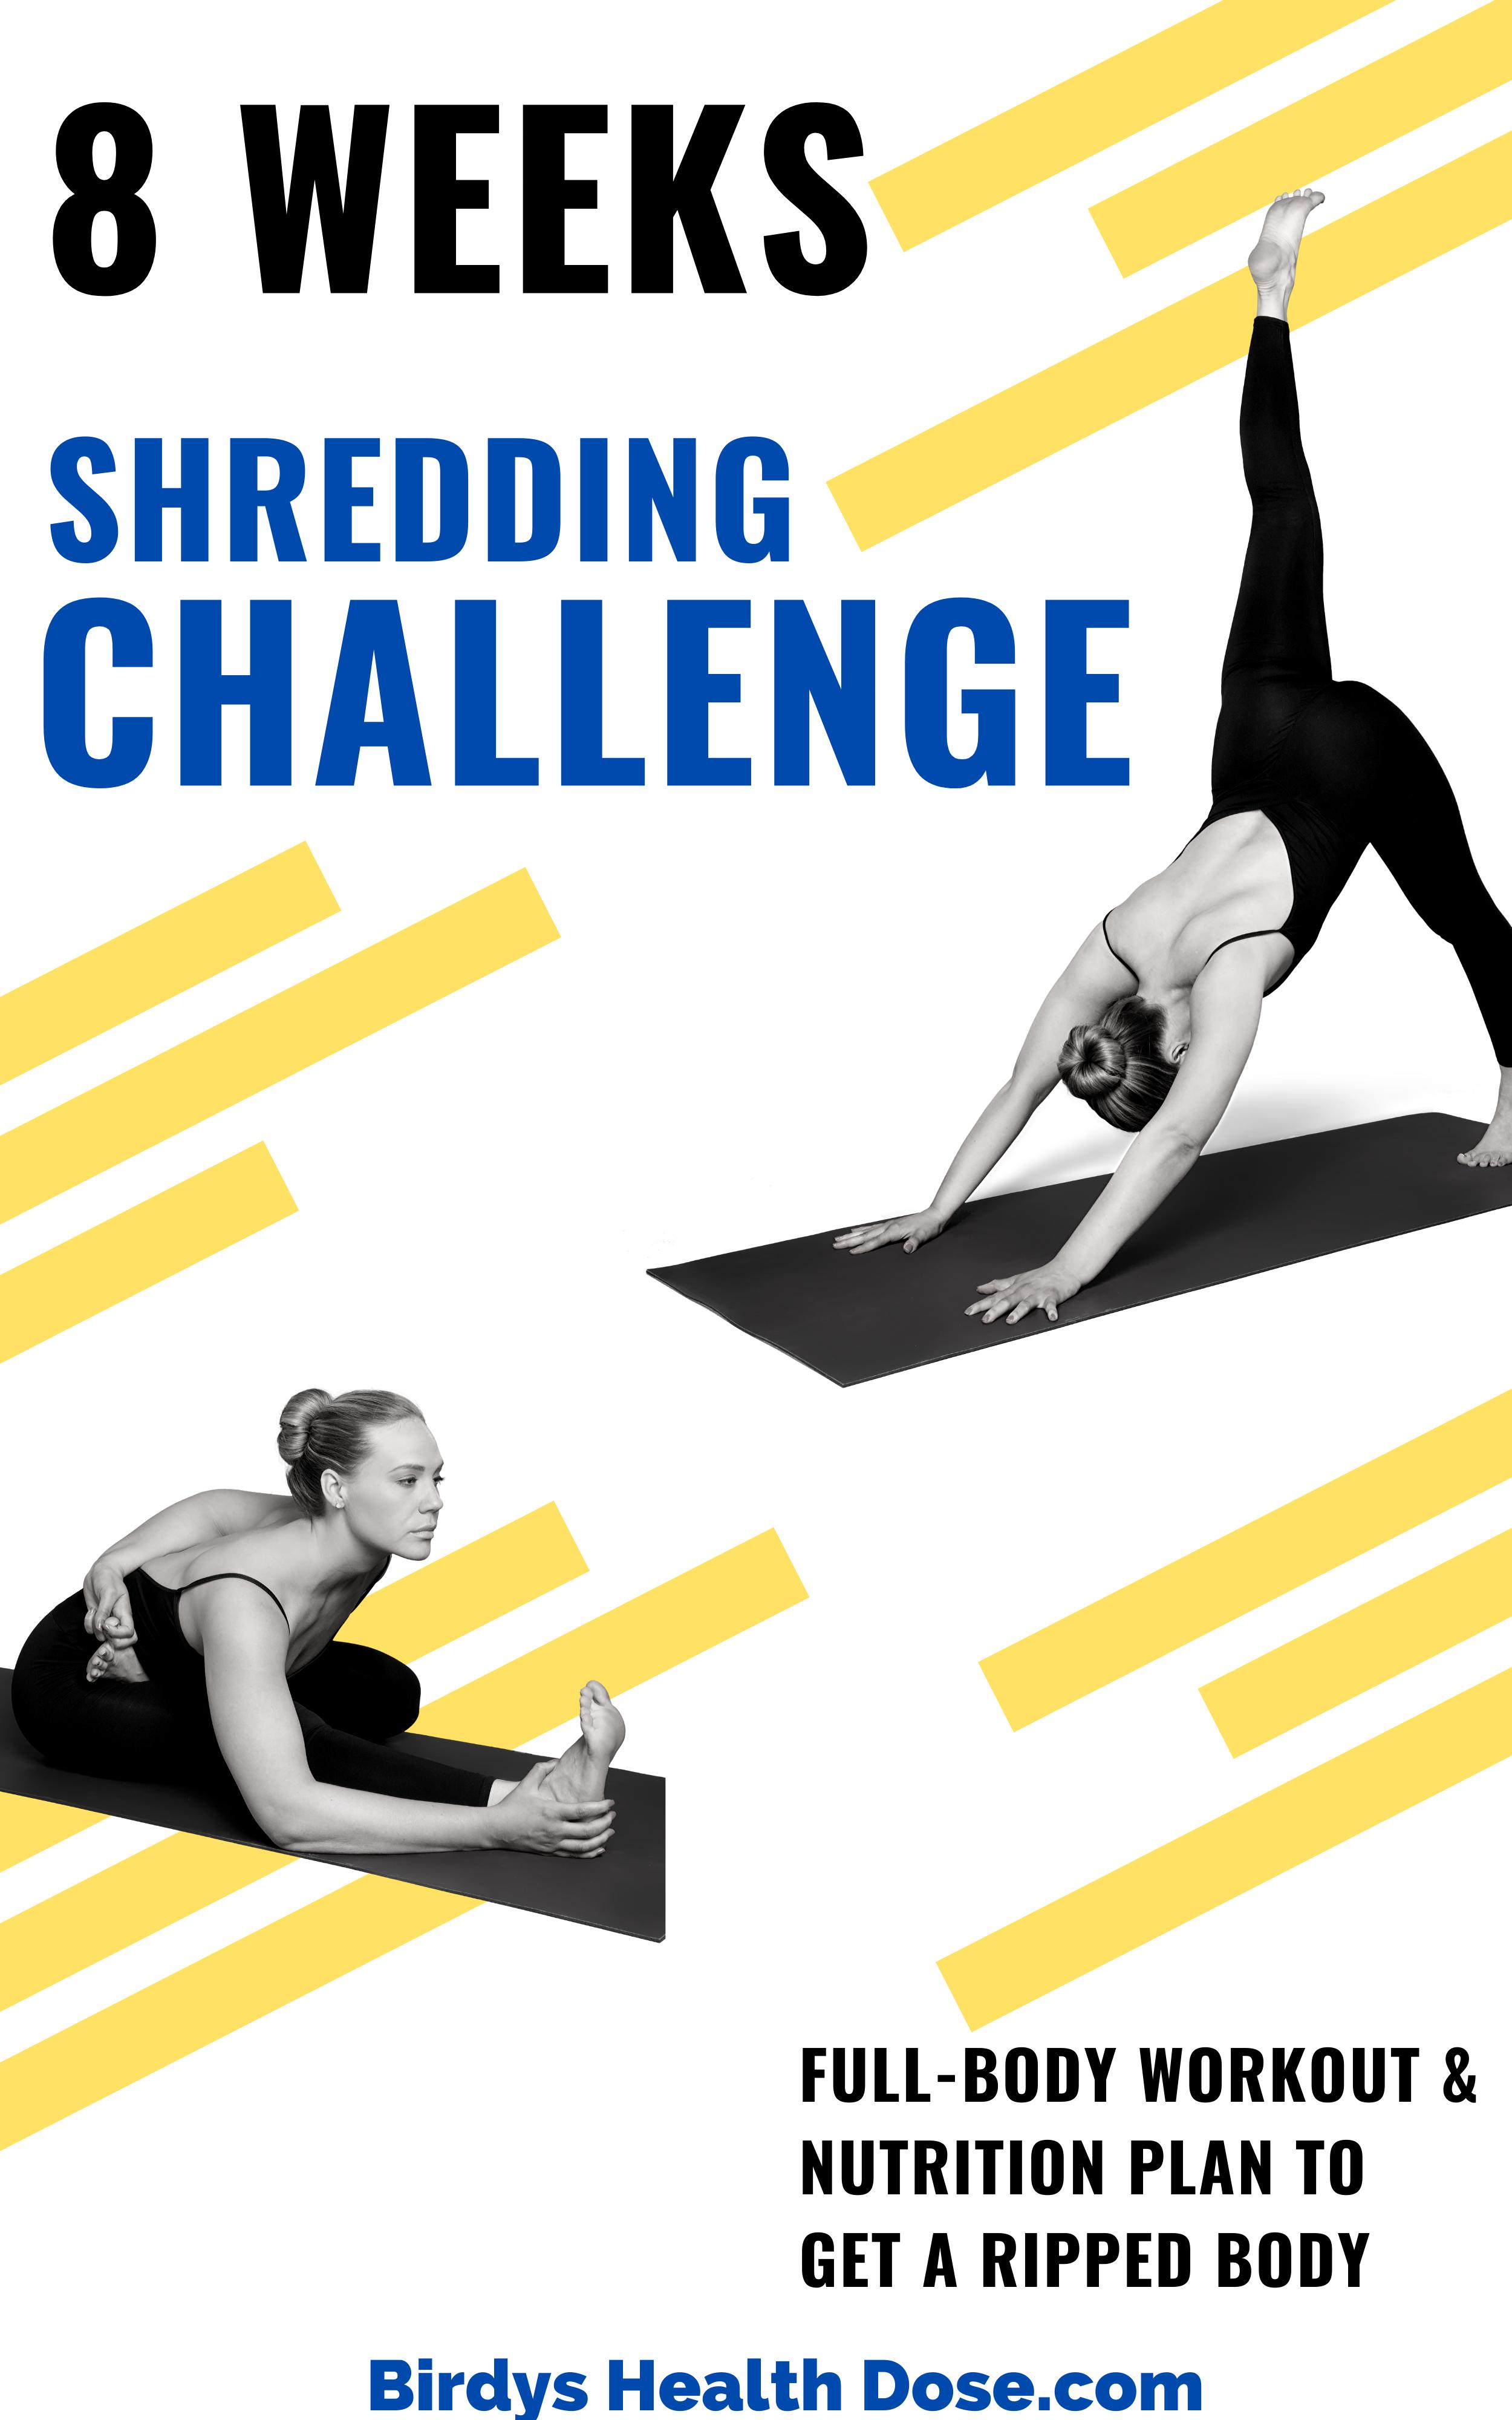 8 weeks shredding challenge schedule - full body workout ...